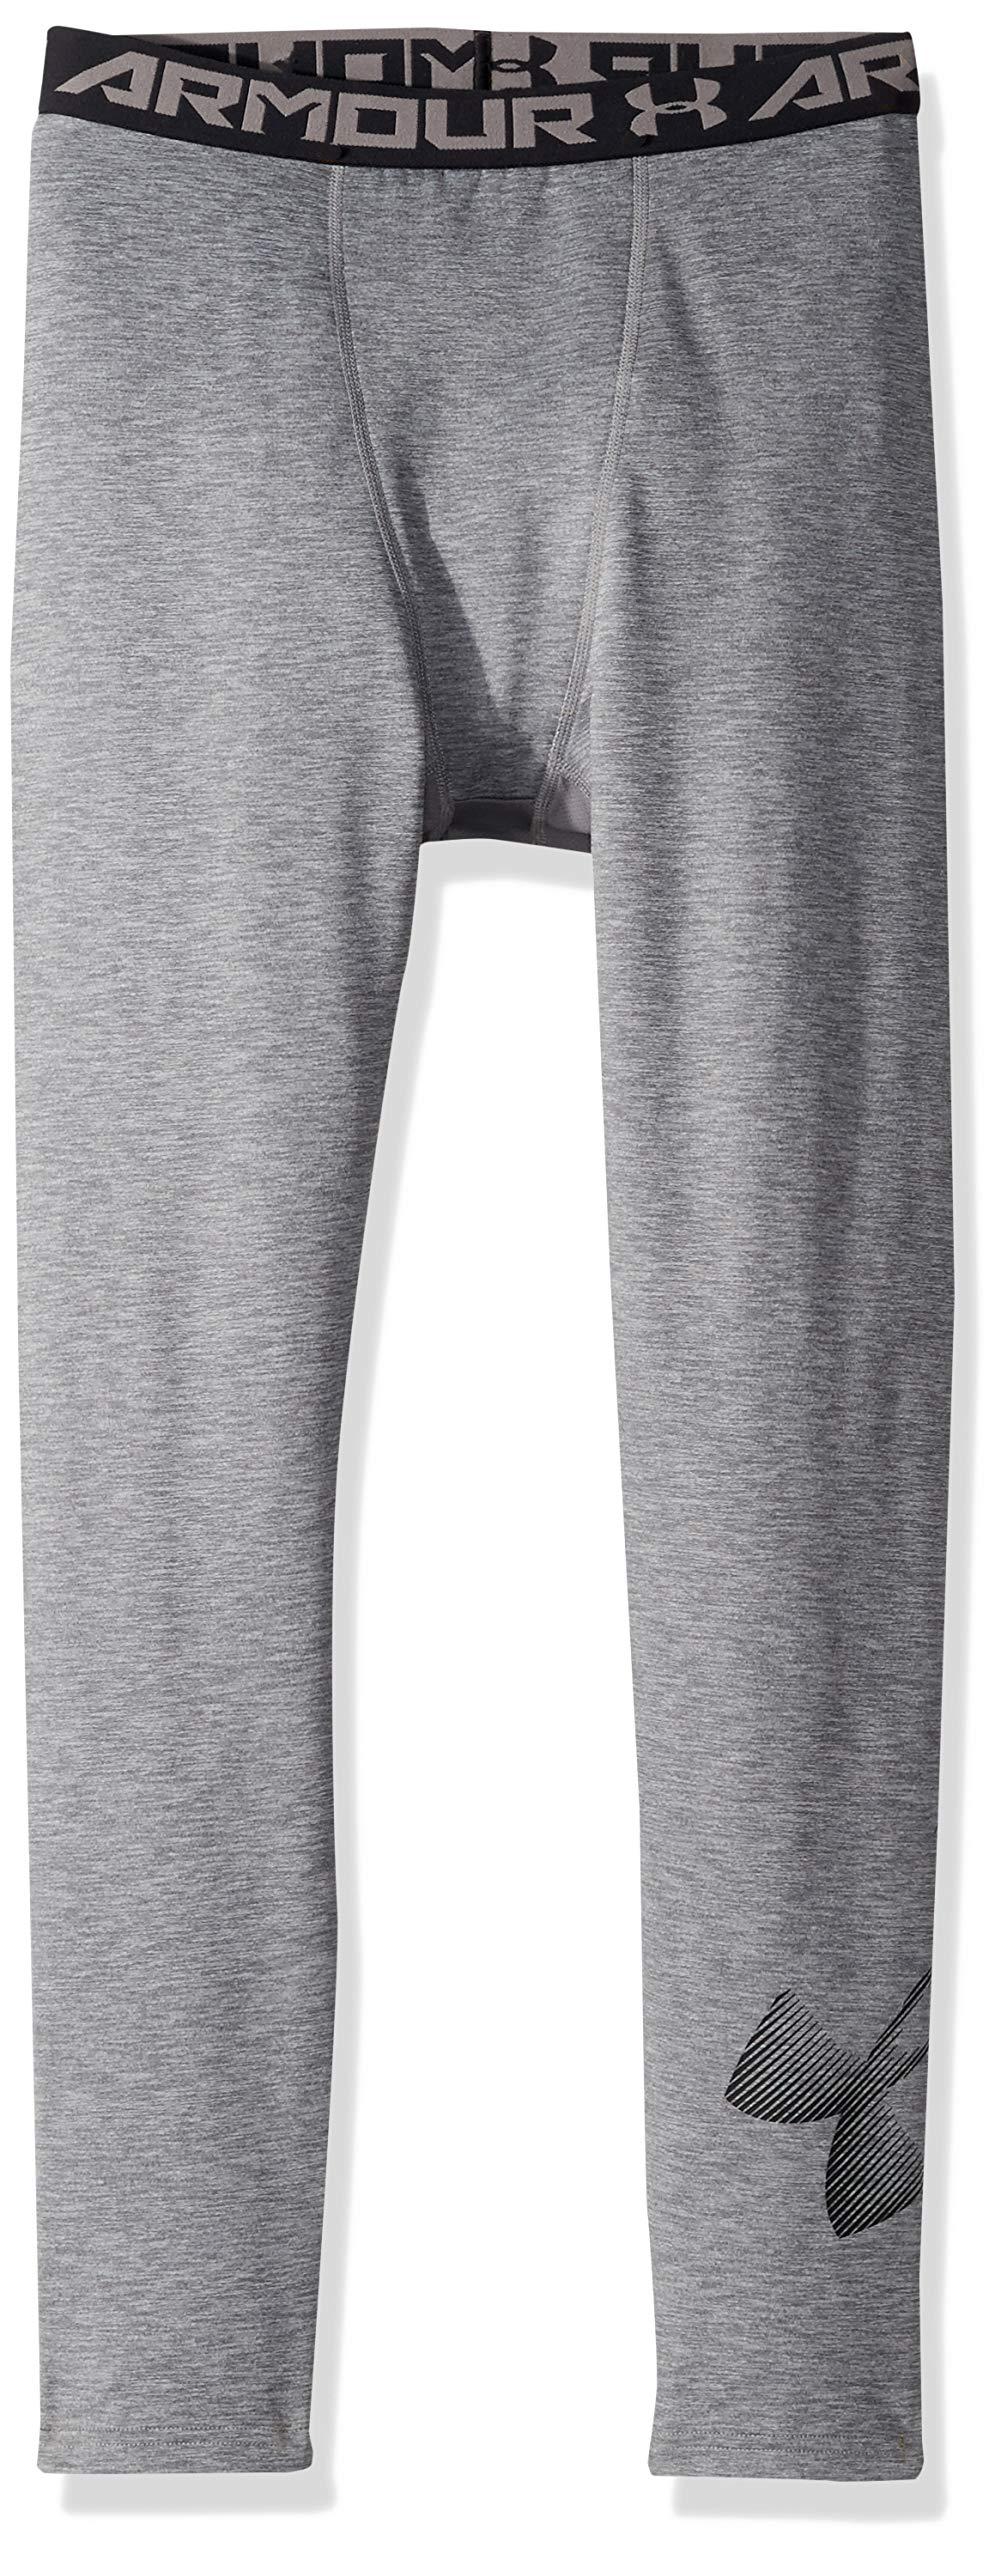 Under Armour Boys' ColdGear Leggings, Graphite Light Heath (040)/Black, Youth Large